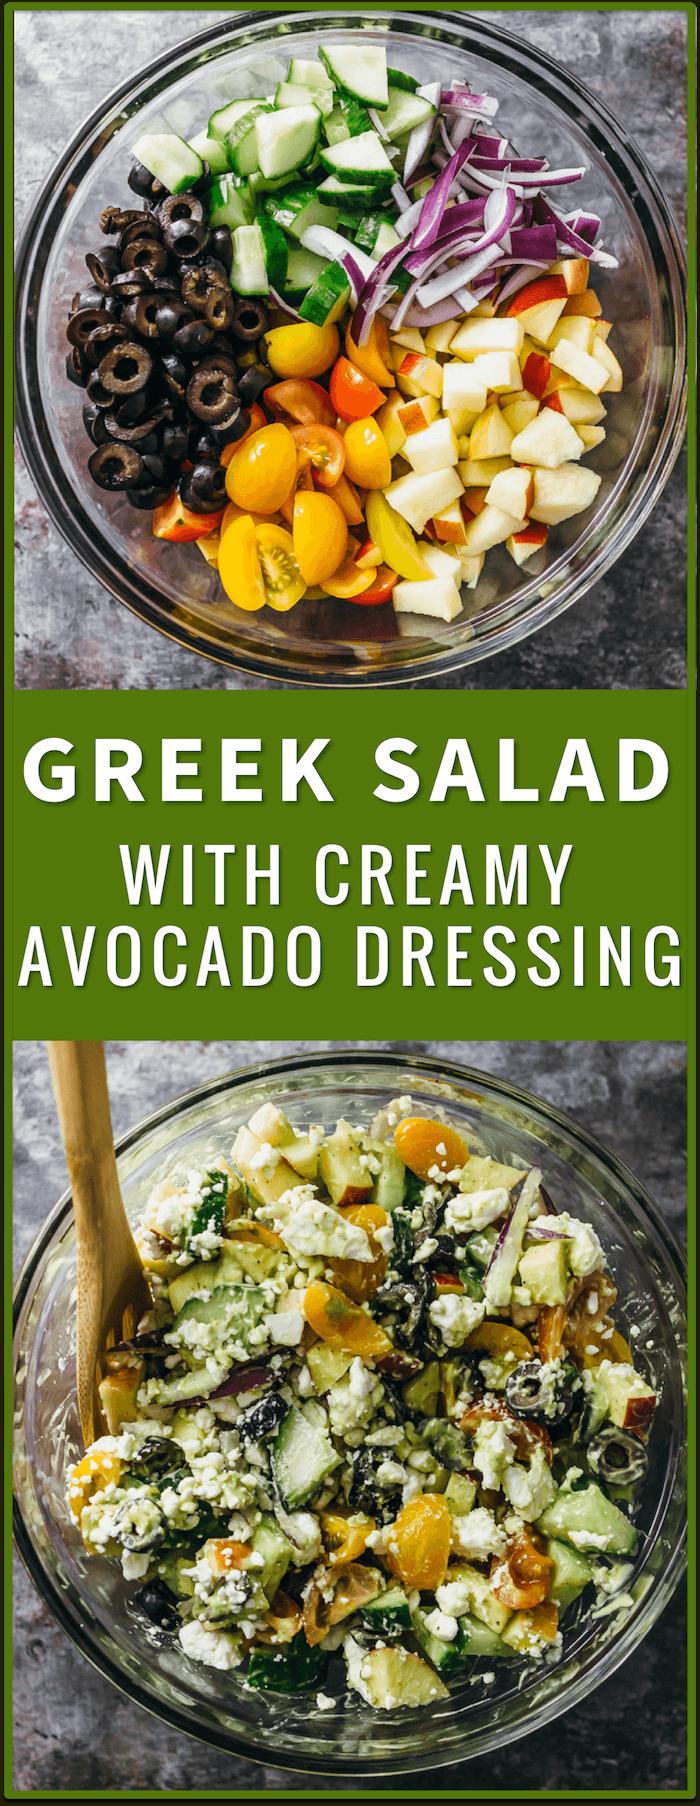 Greek salad with creamy avocado dressing, greek salad dressing recipe, traditional greek salad, greek pasta salad recipe, best greek salad recipe with chicken, easy greek salad recipe, chopped greek salad, healthy, ensalada griega greek salad, easy, authentic, pasta, cucumber